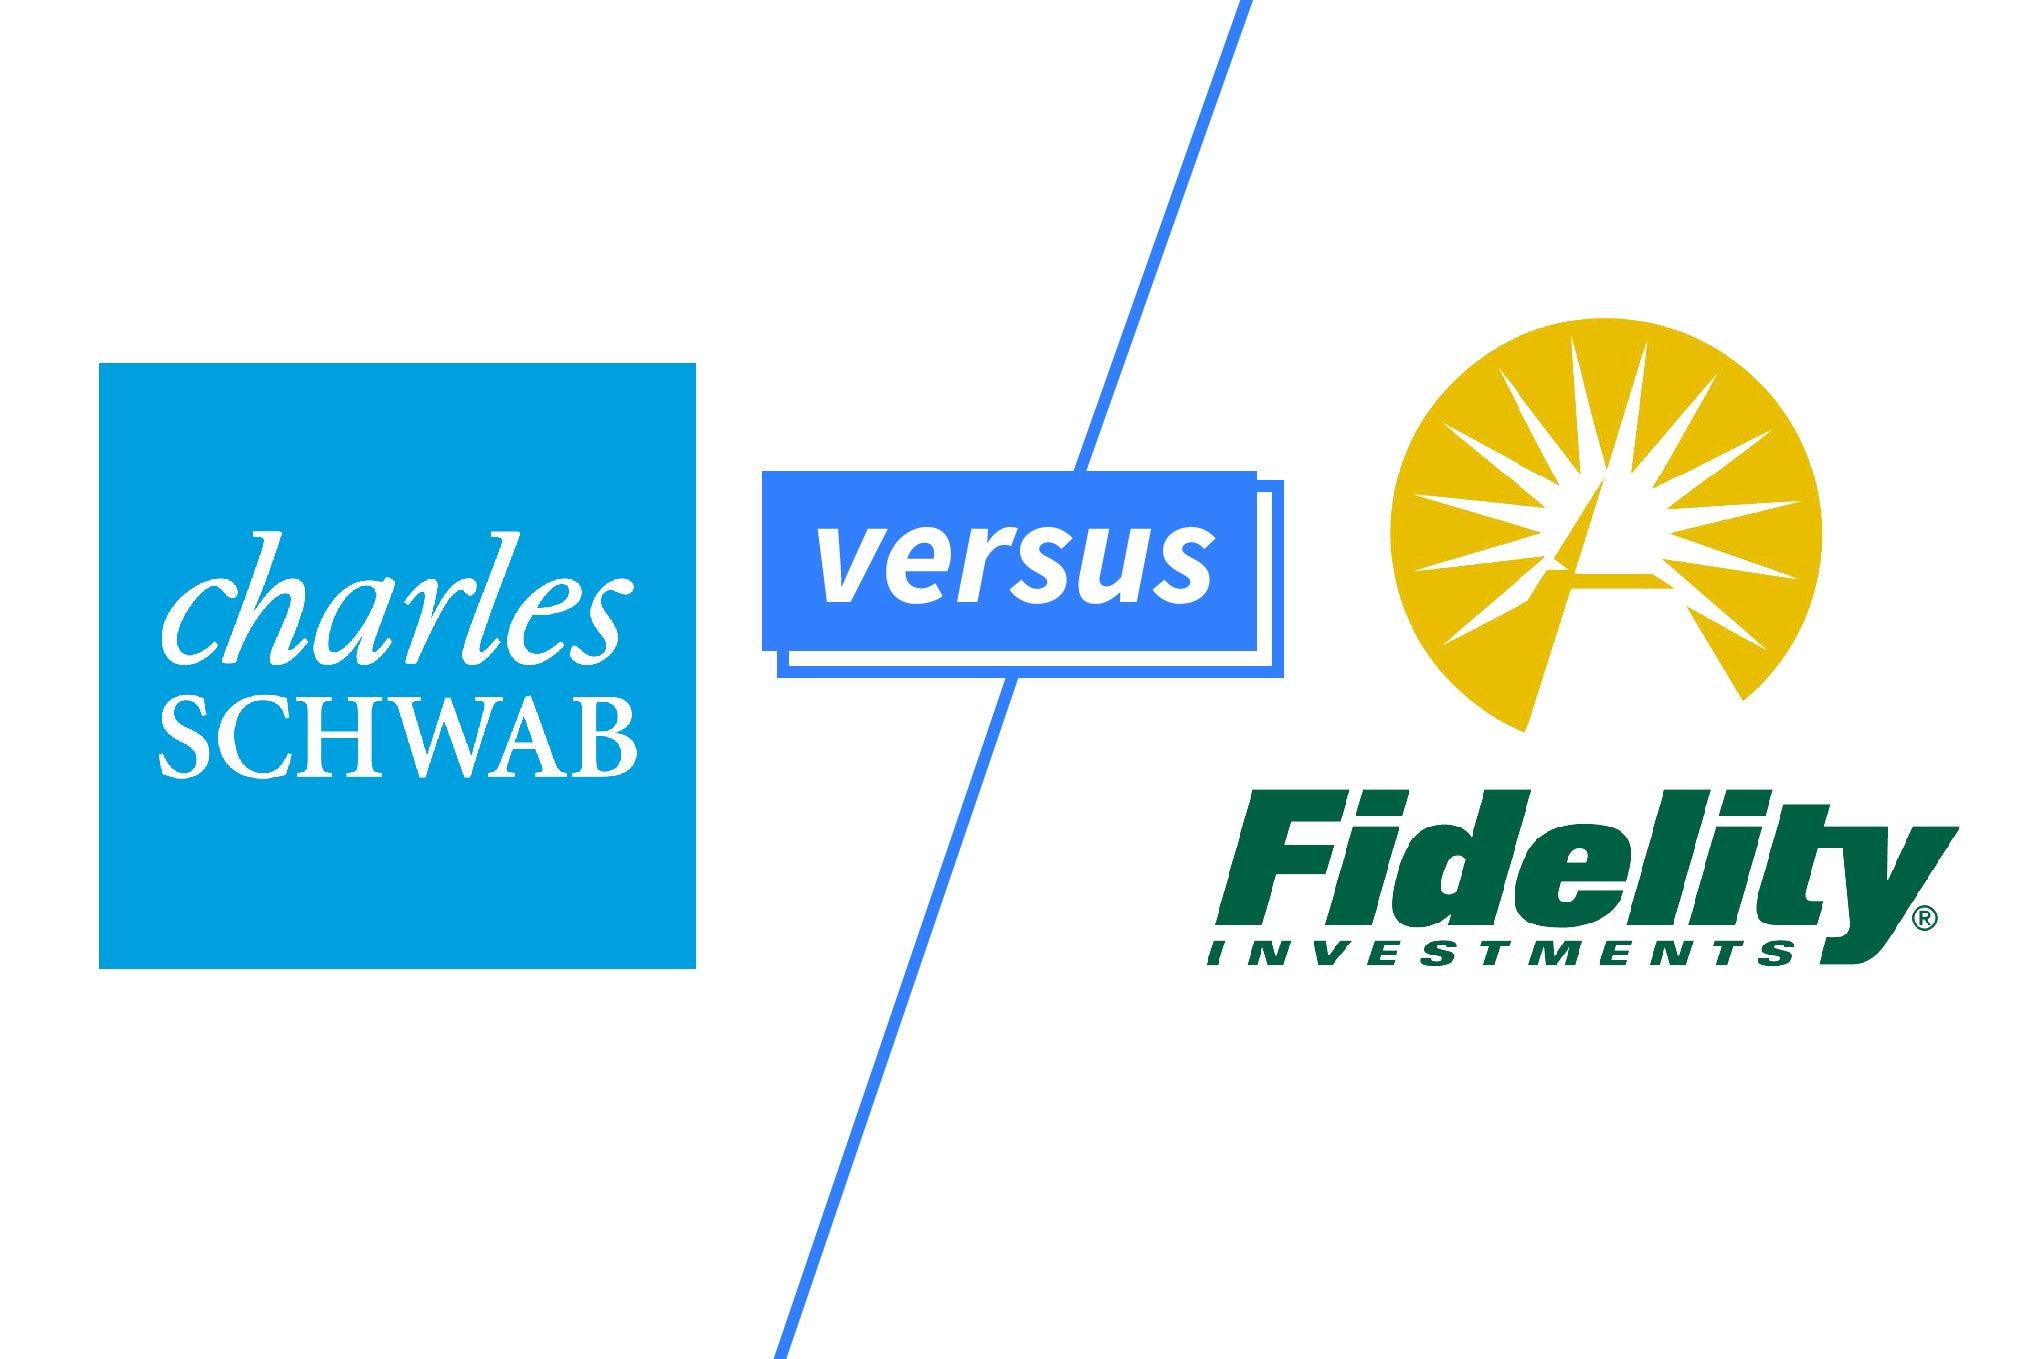 charles schwab vs fidelity which broker is better investopedia